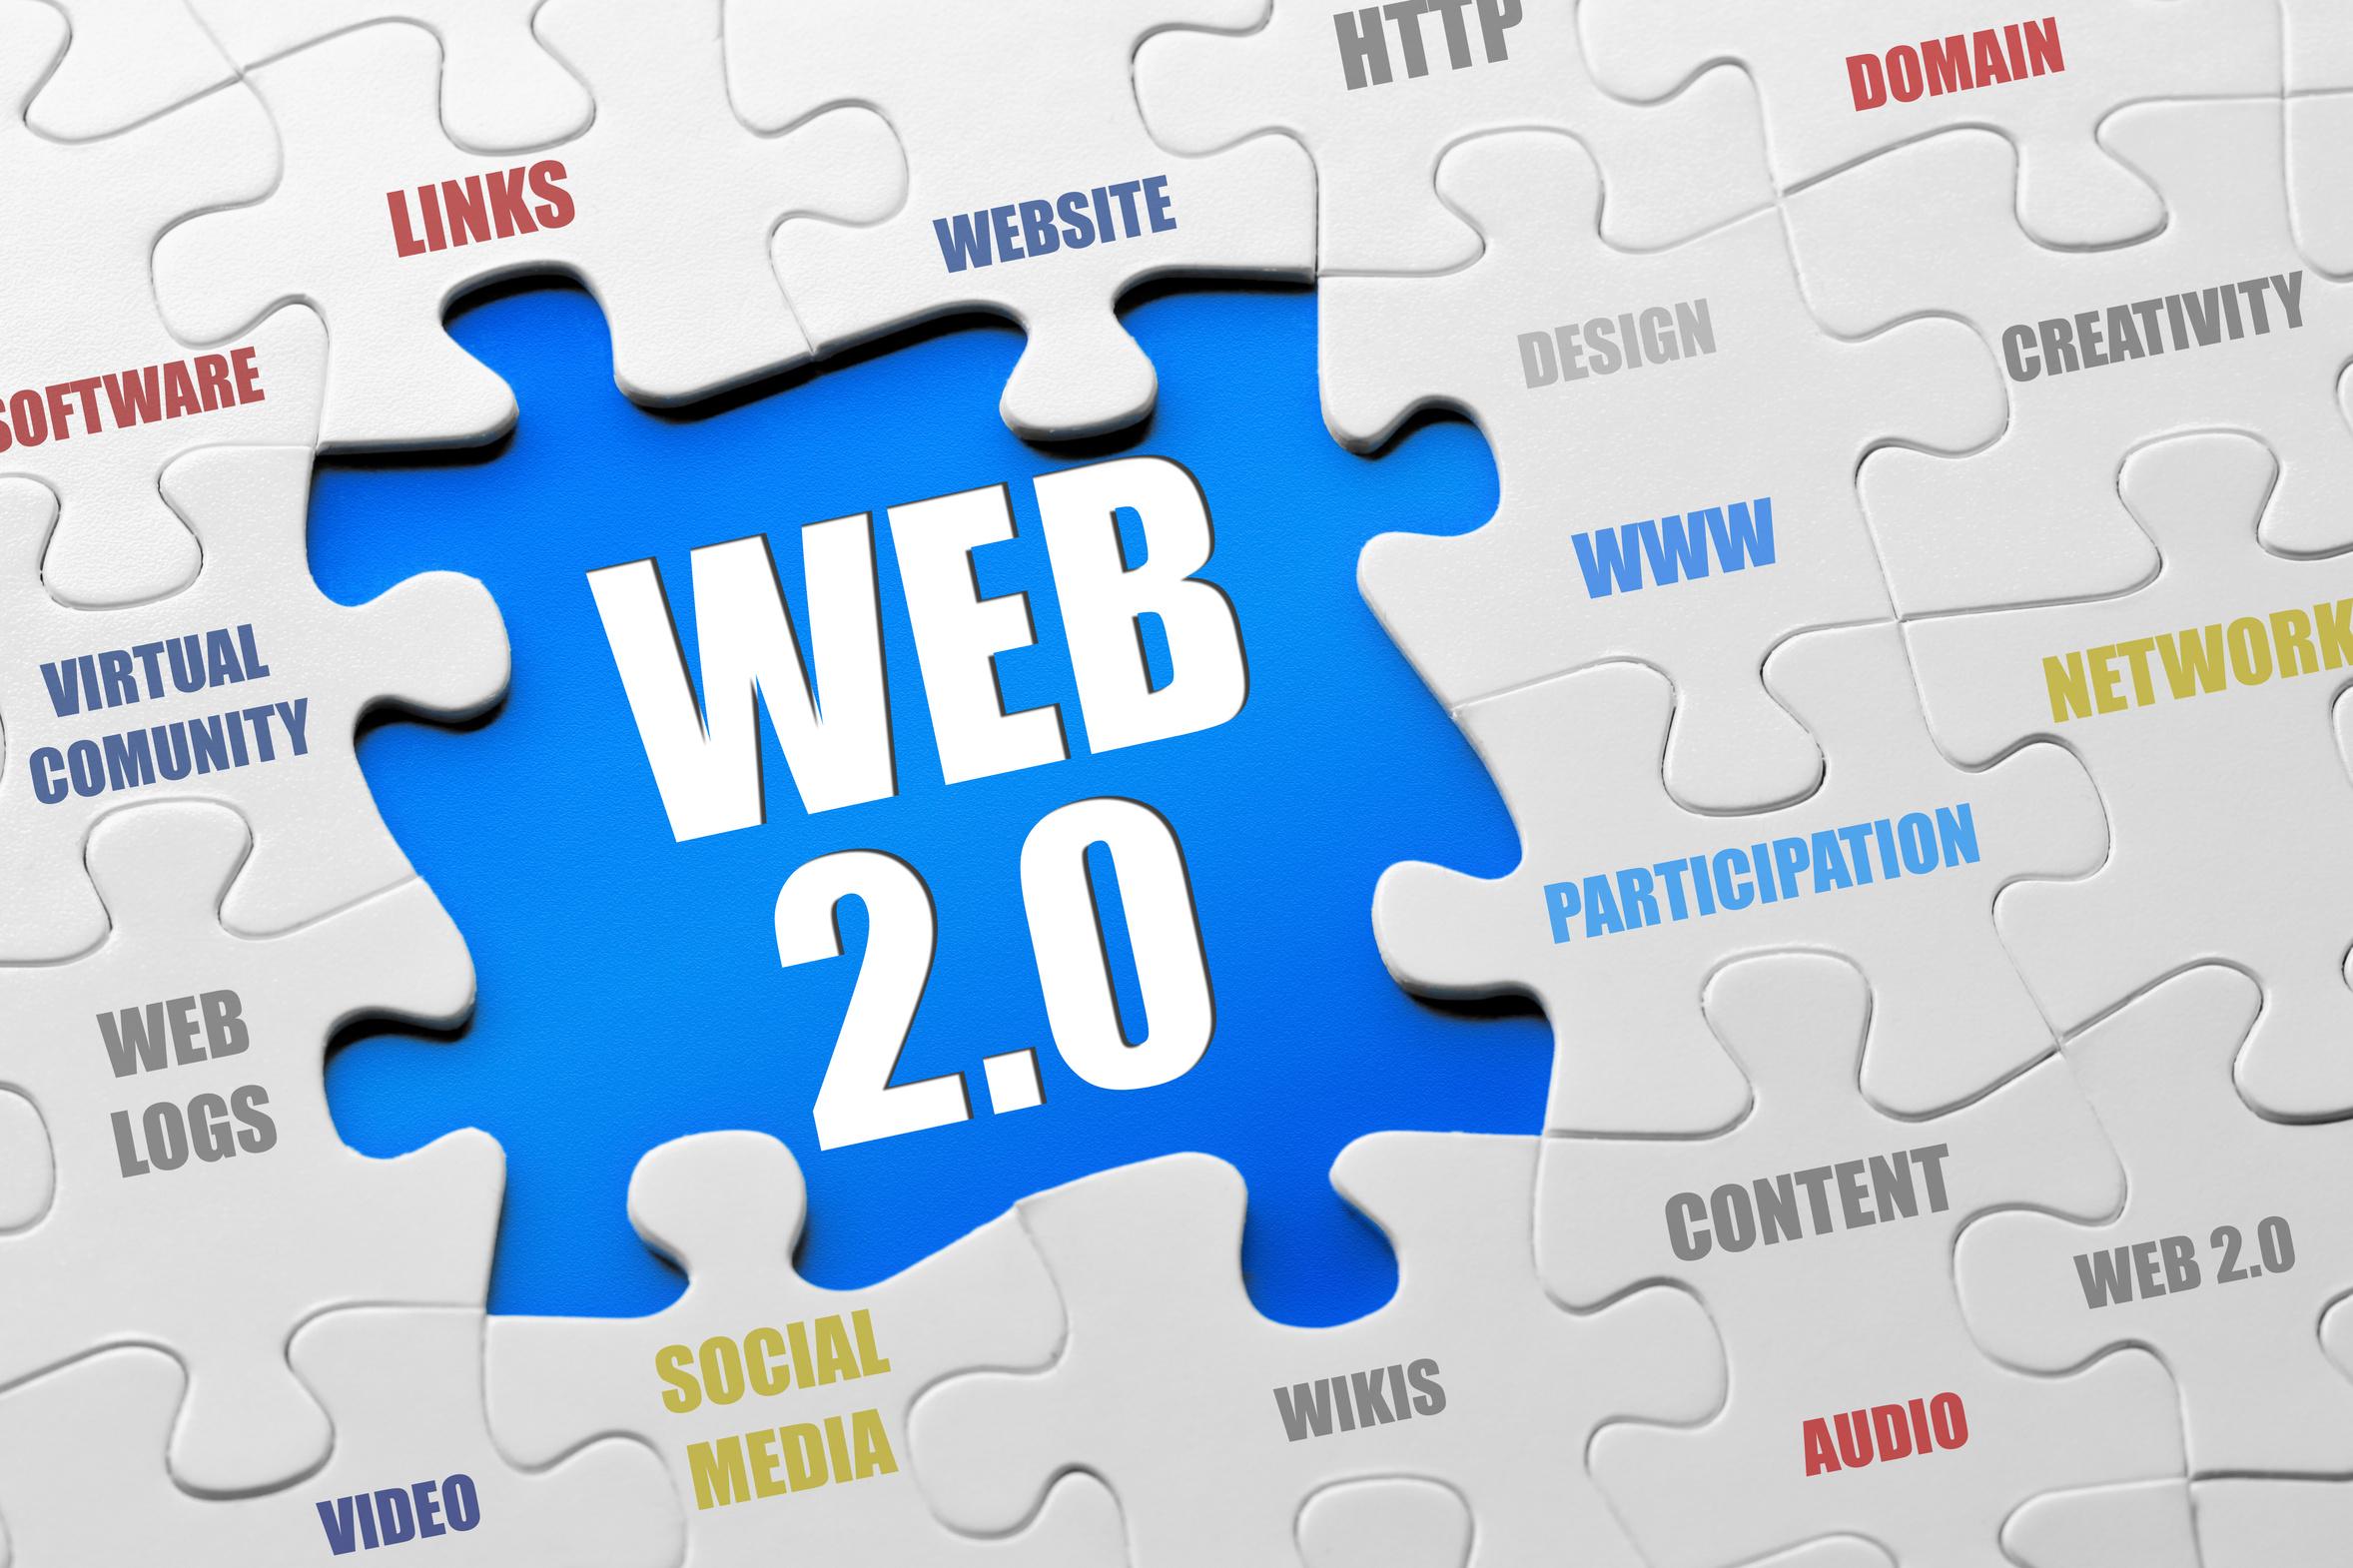 10+2 links of HIGH DA PA Web 2.0 bid.